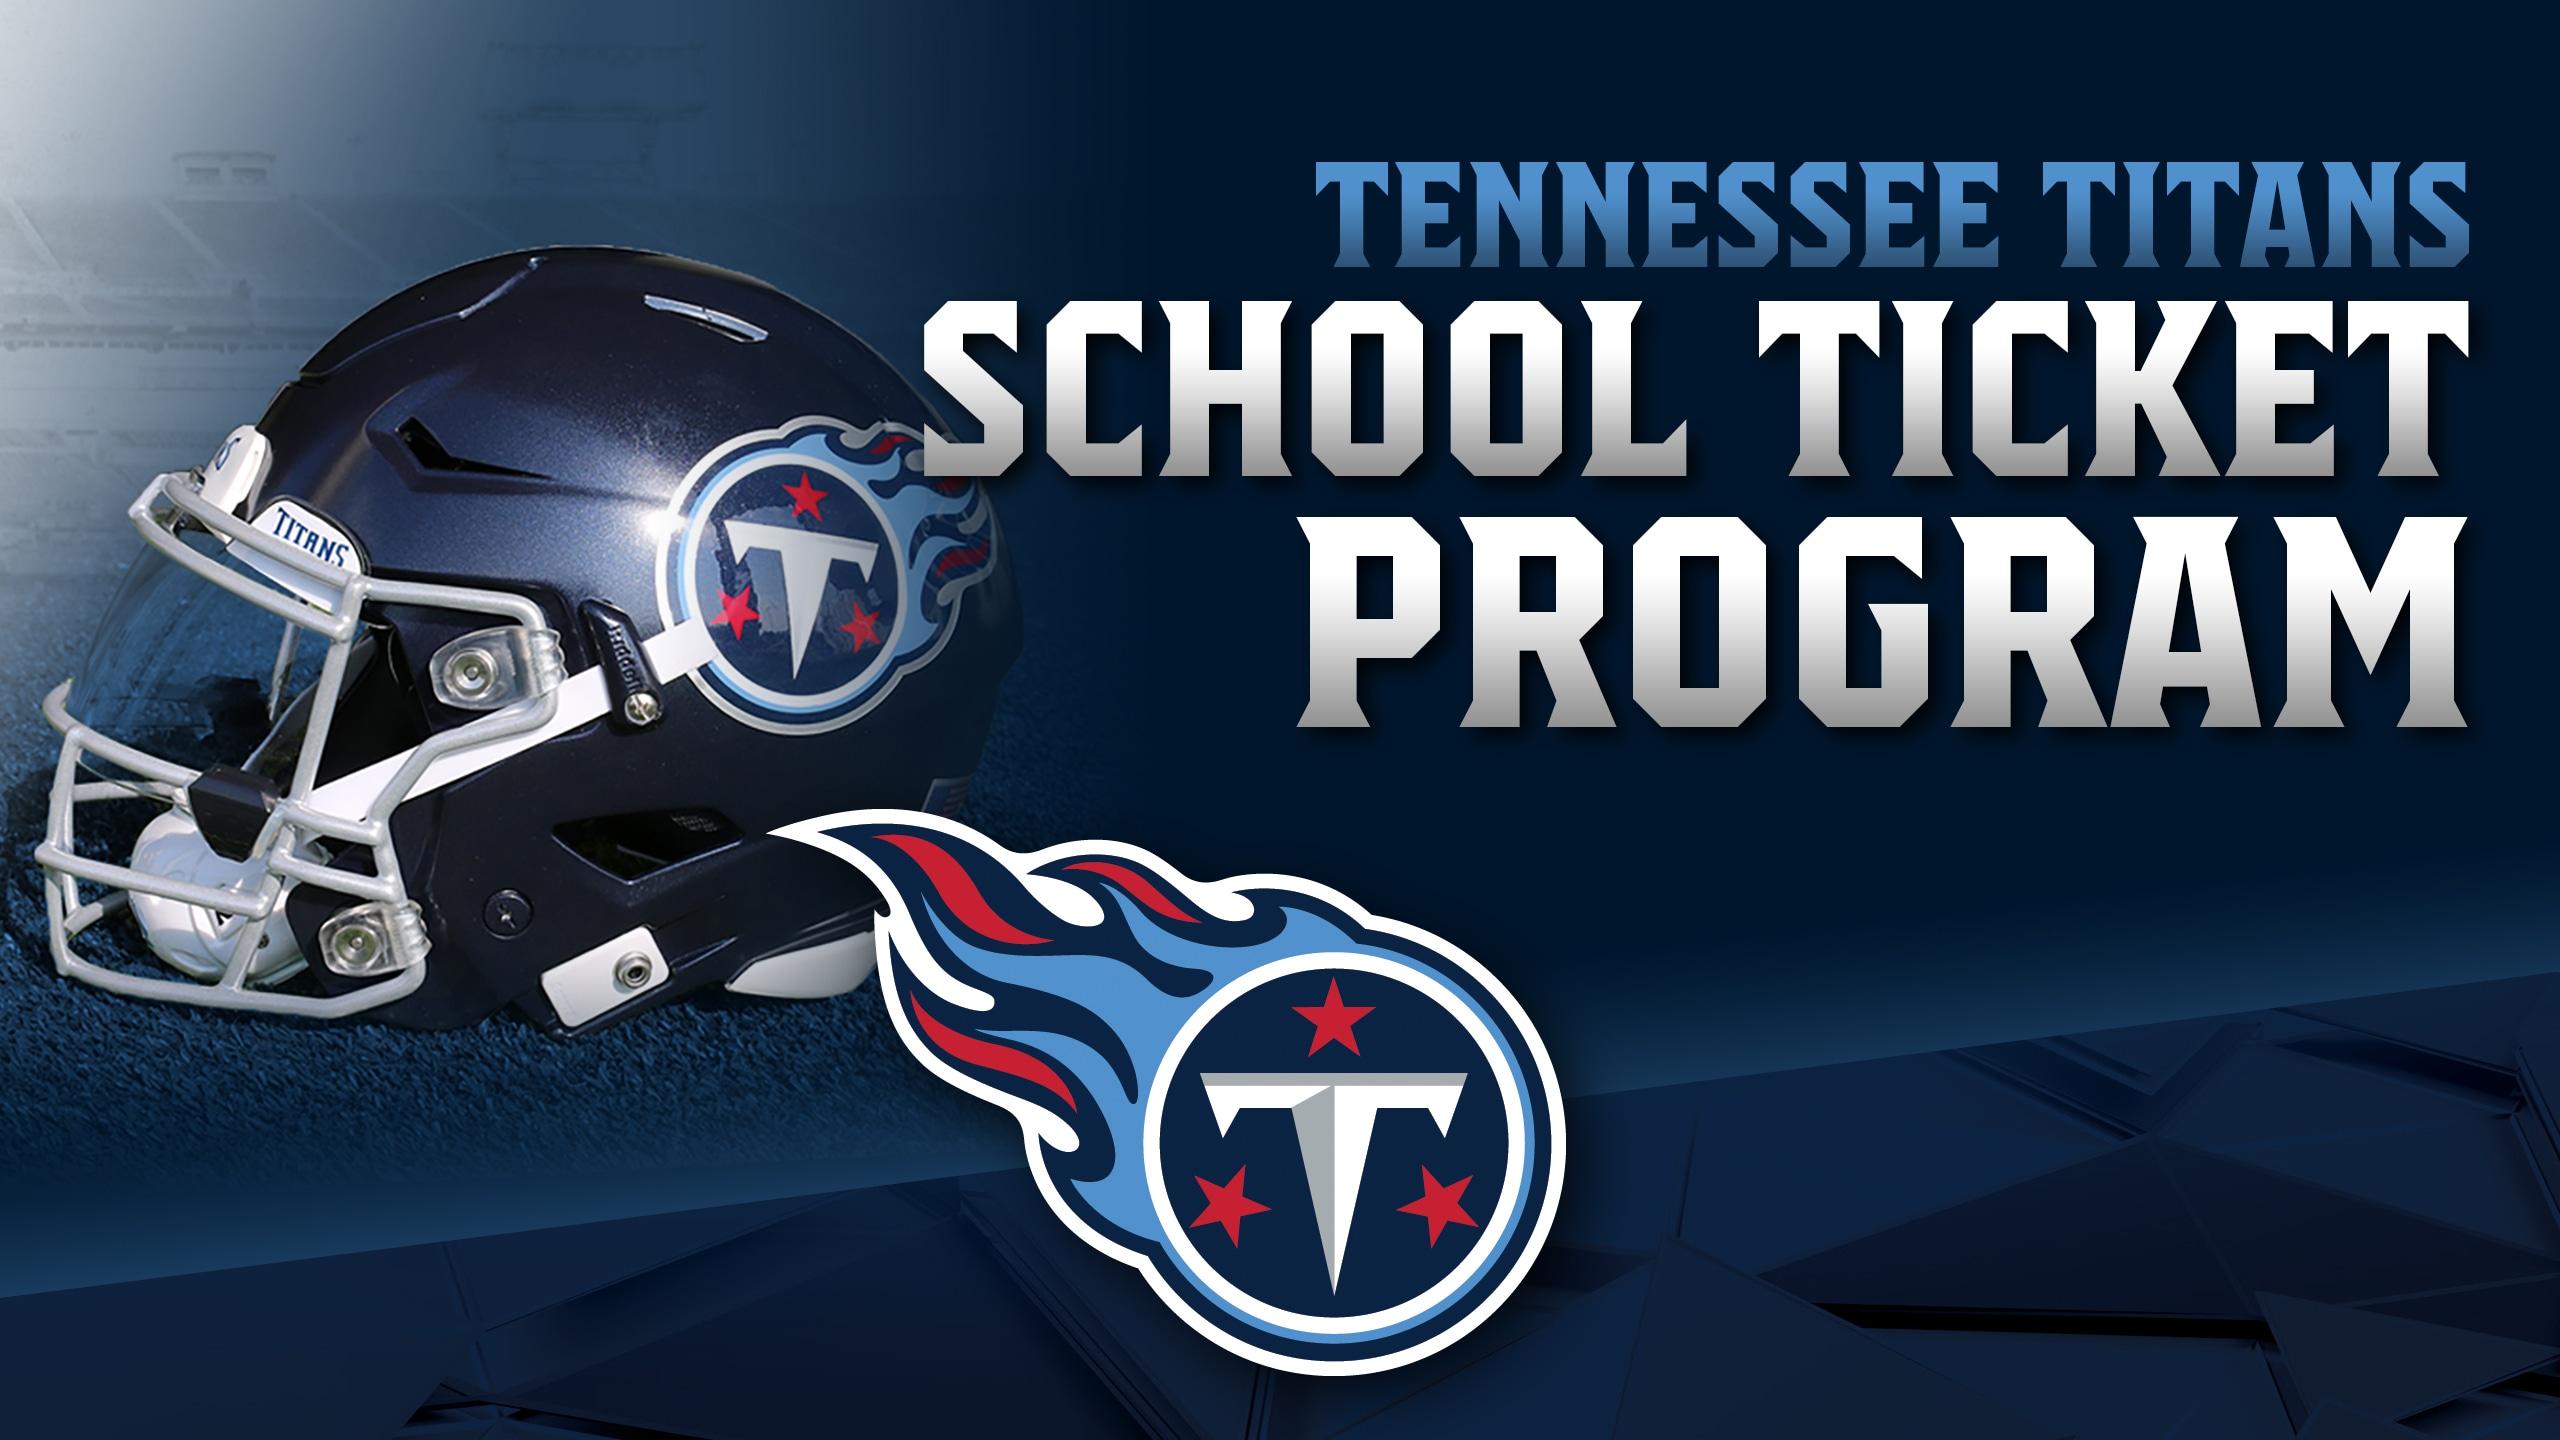 Titans School Ticket Program